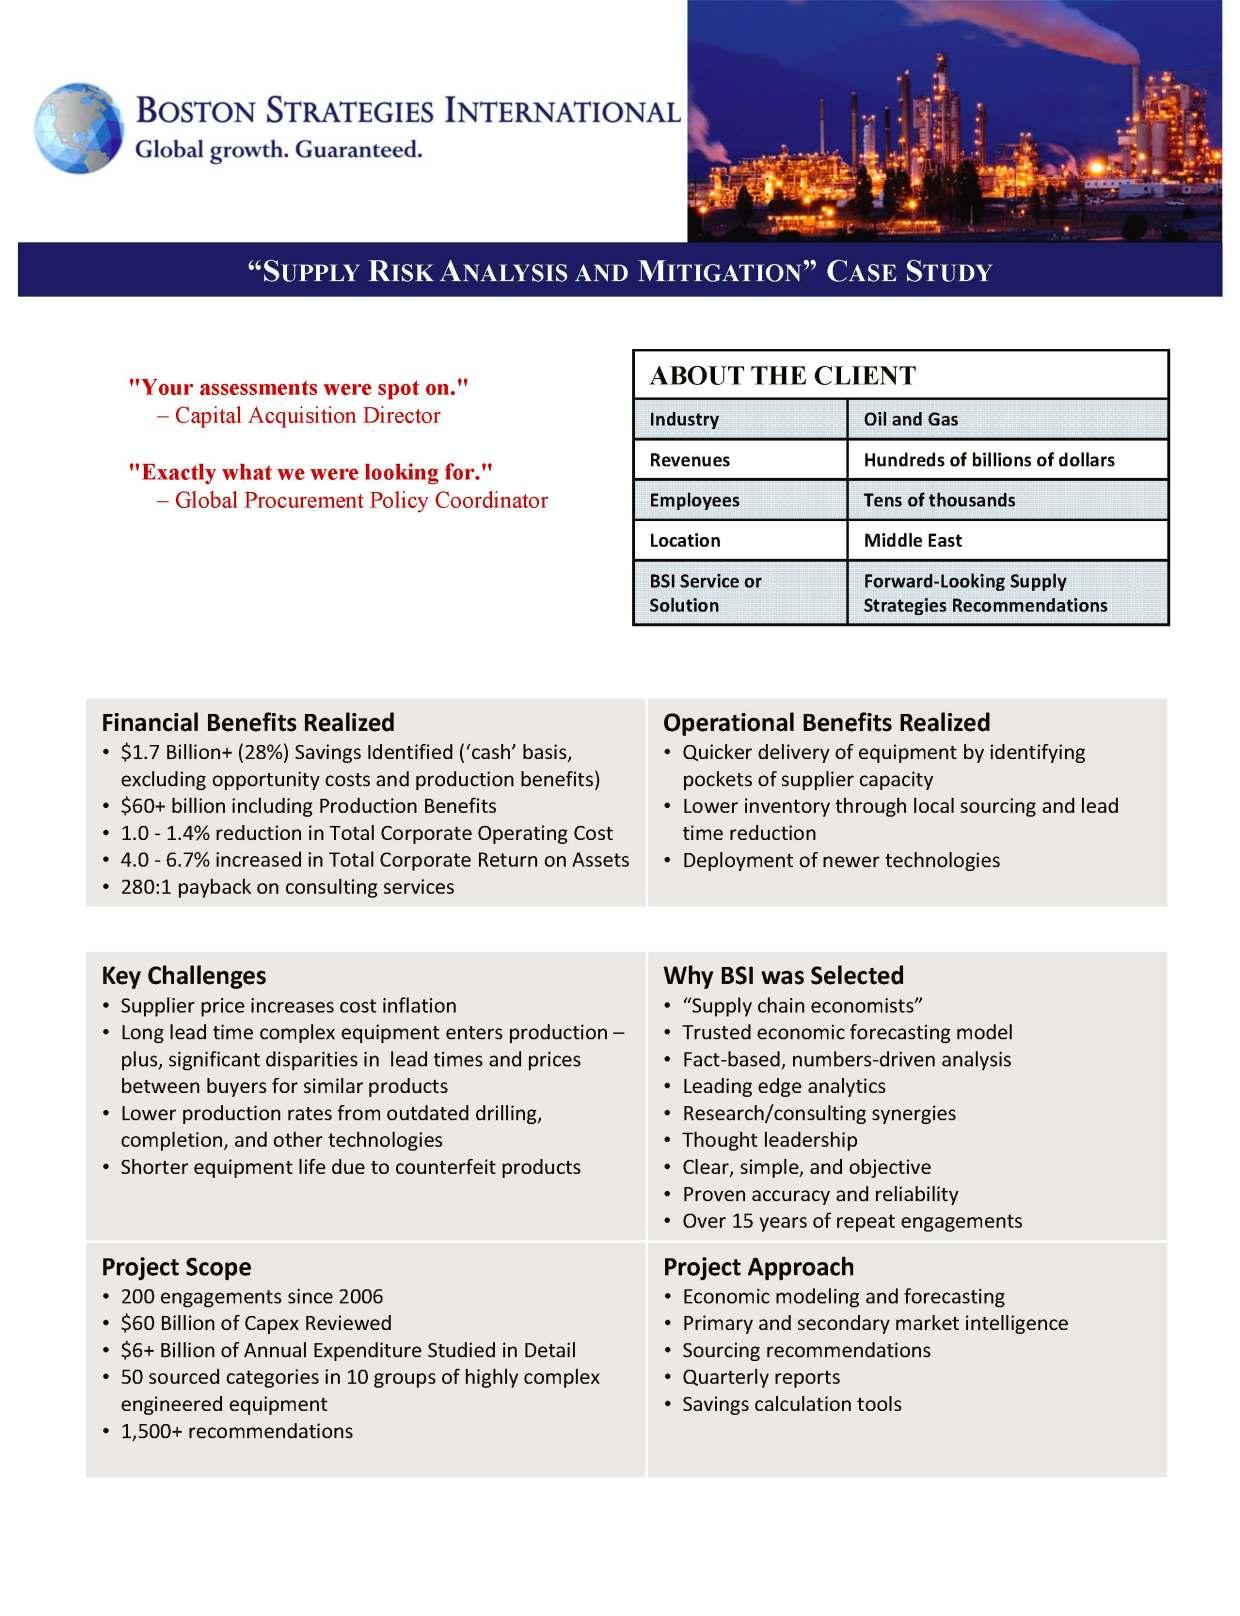 Supply Risk Mitigation Case Study 110318 cps 150602 dj